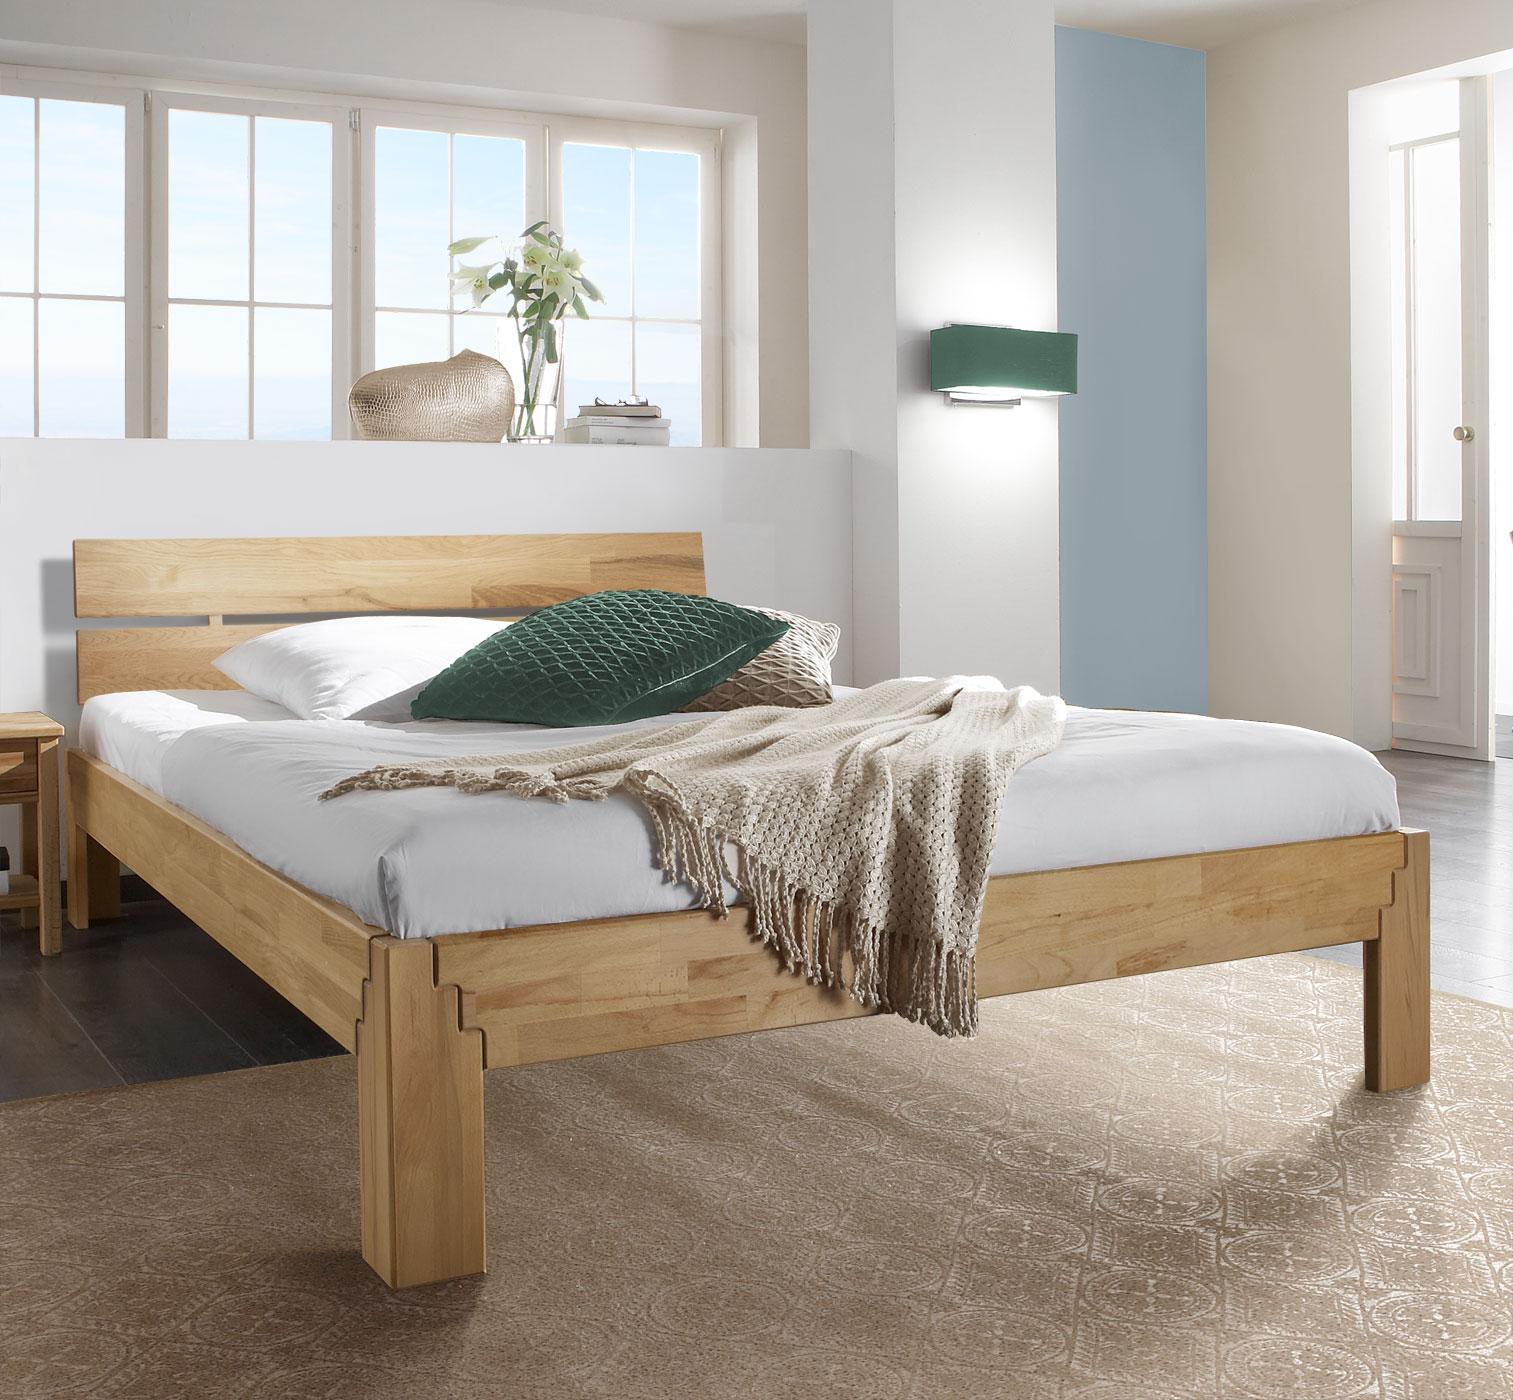 segmüller schlafzimmer betten ~ home design inspiration